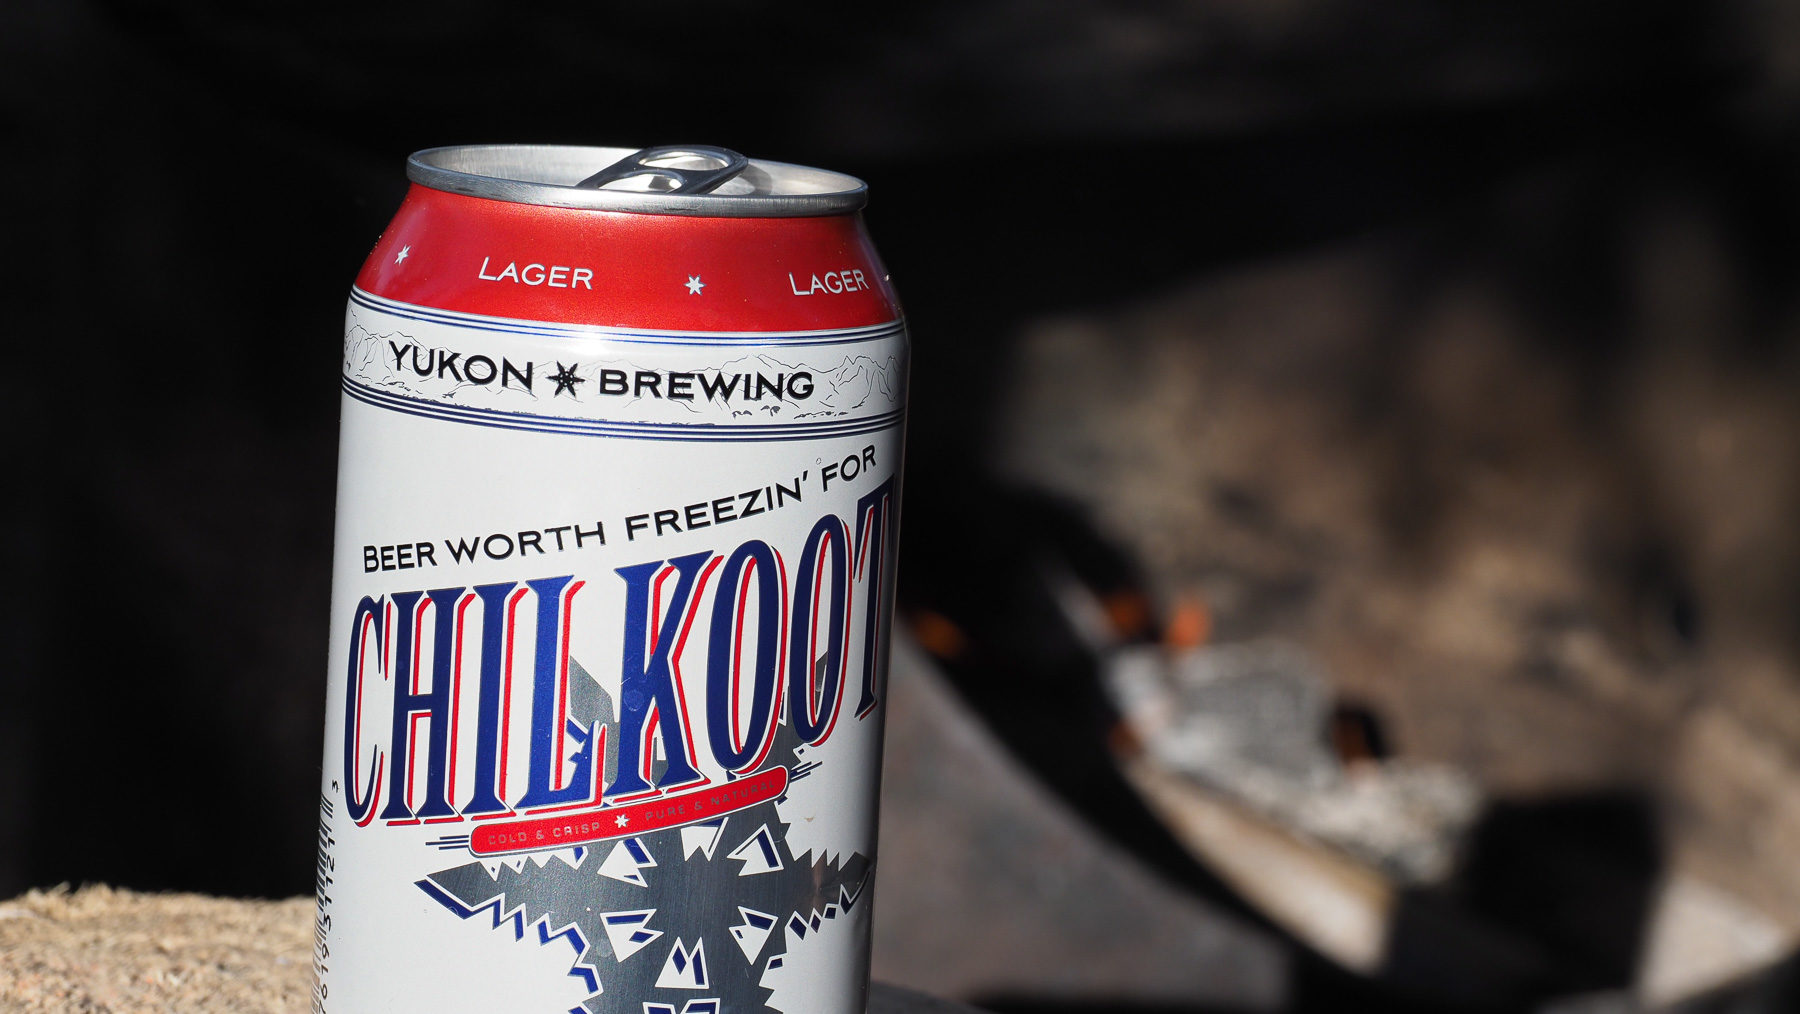 """Beer worth freezin' for"" - es ist immer noch kalt im Juni"